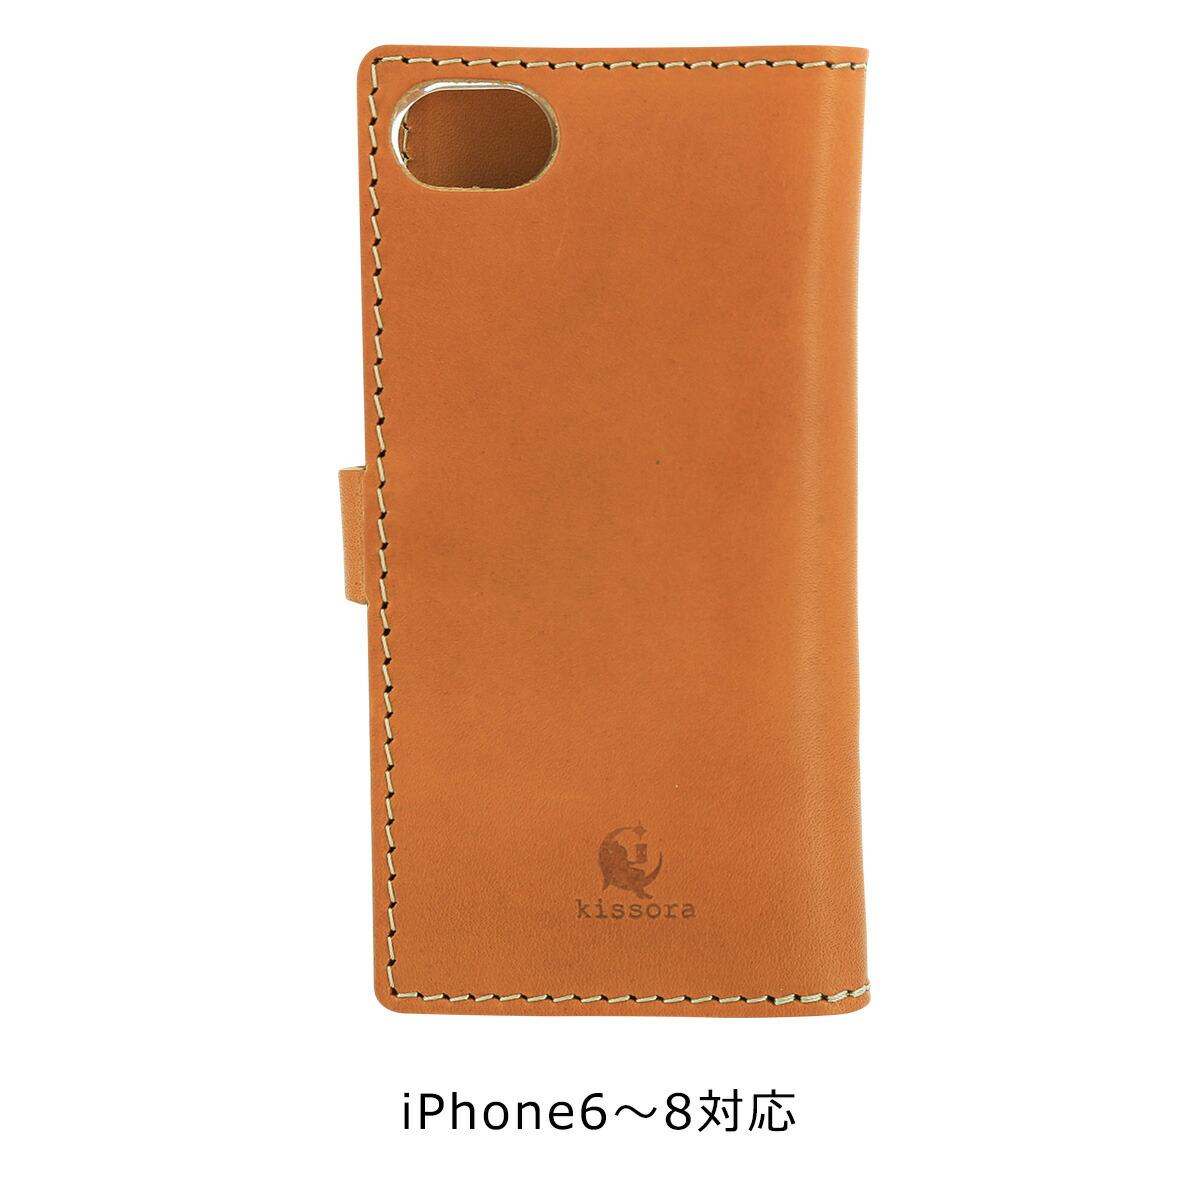 e02b8ec3af iPhone6/6s iPhone7 iPhone8 iPhonex ケース 本革 kissora キソラ KIBP ...